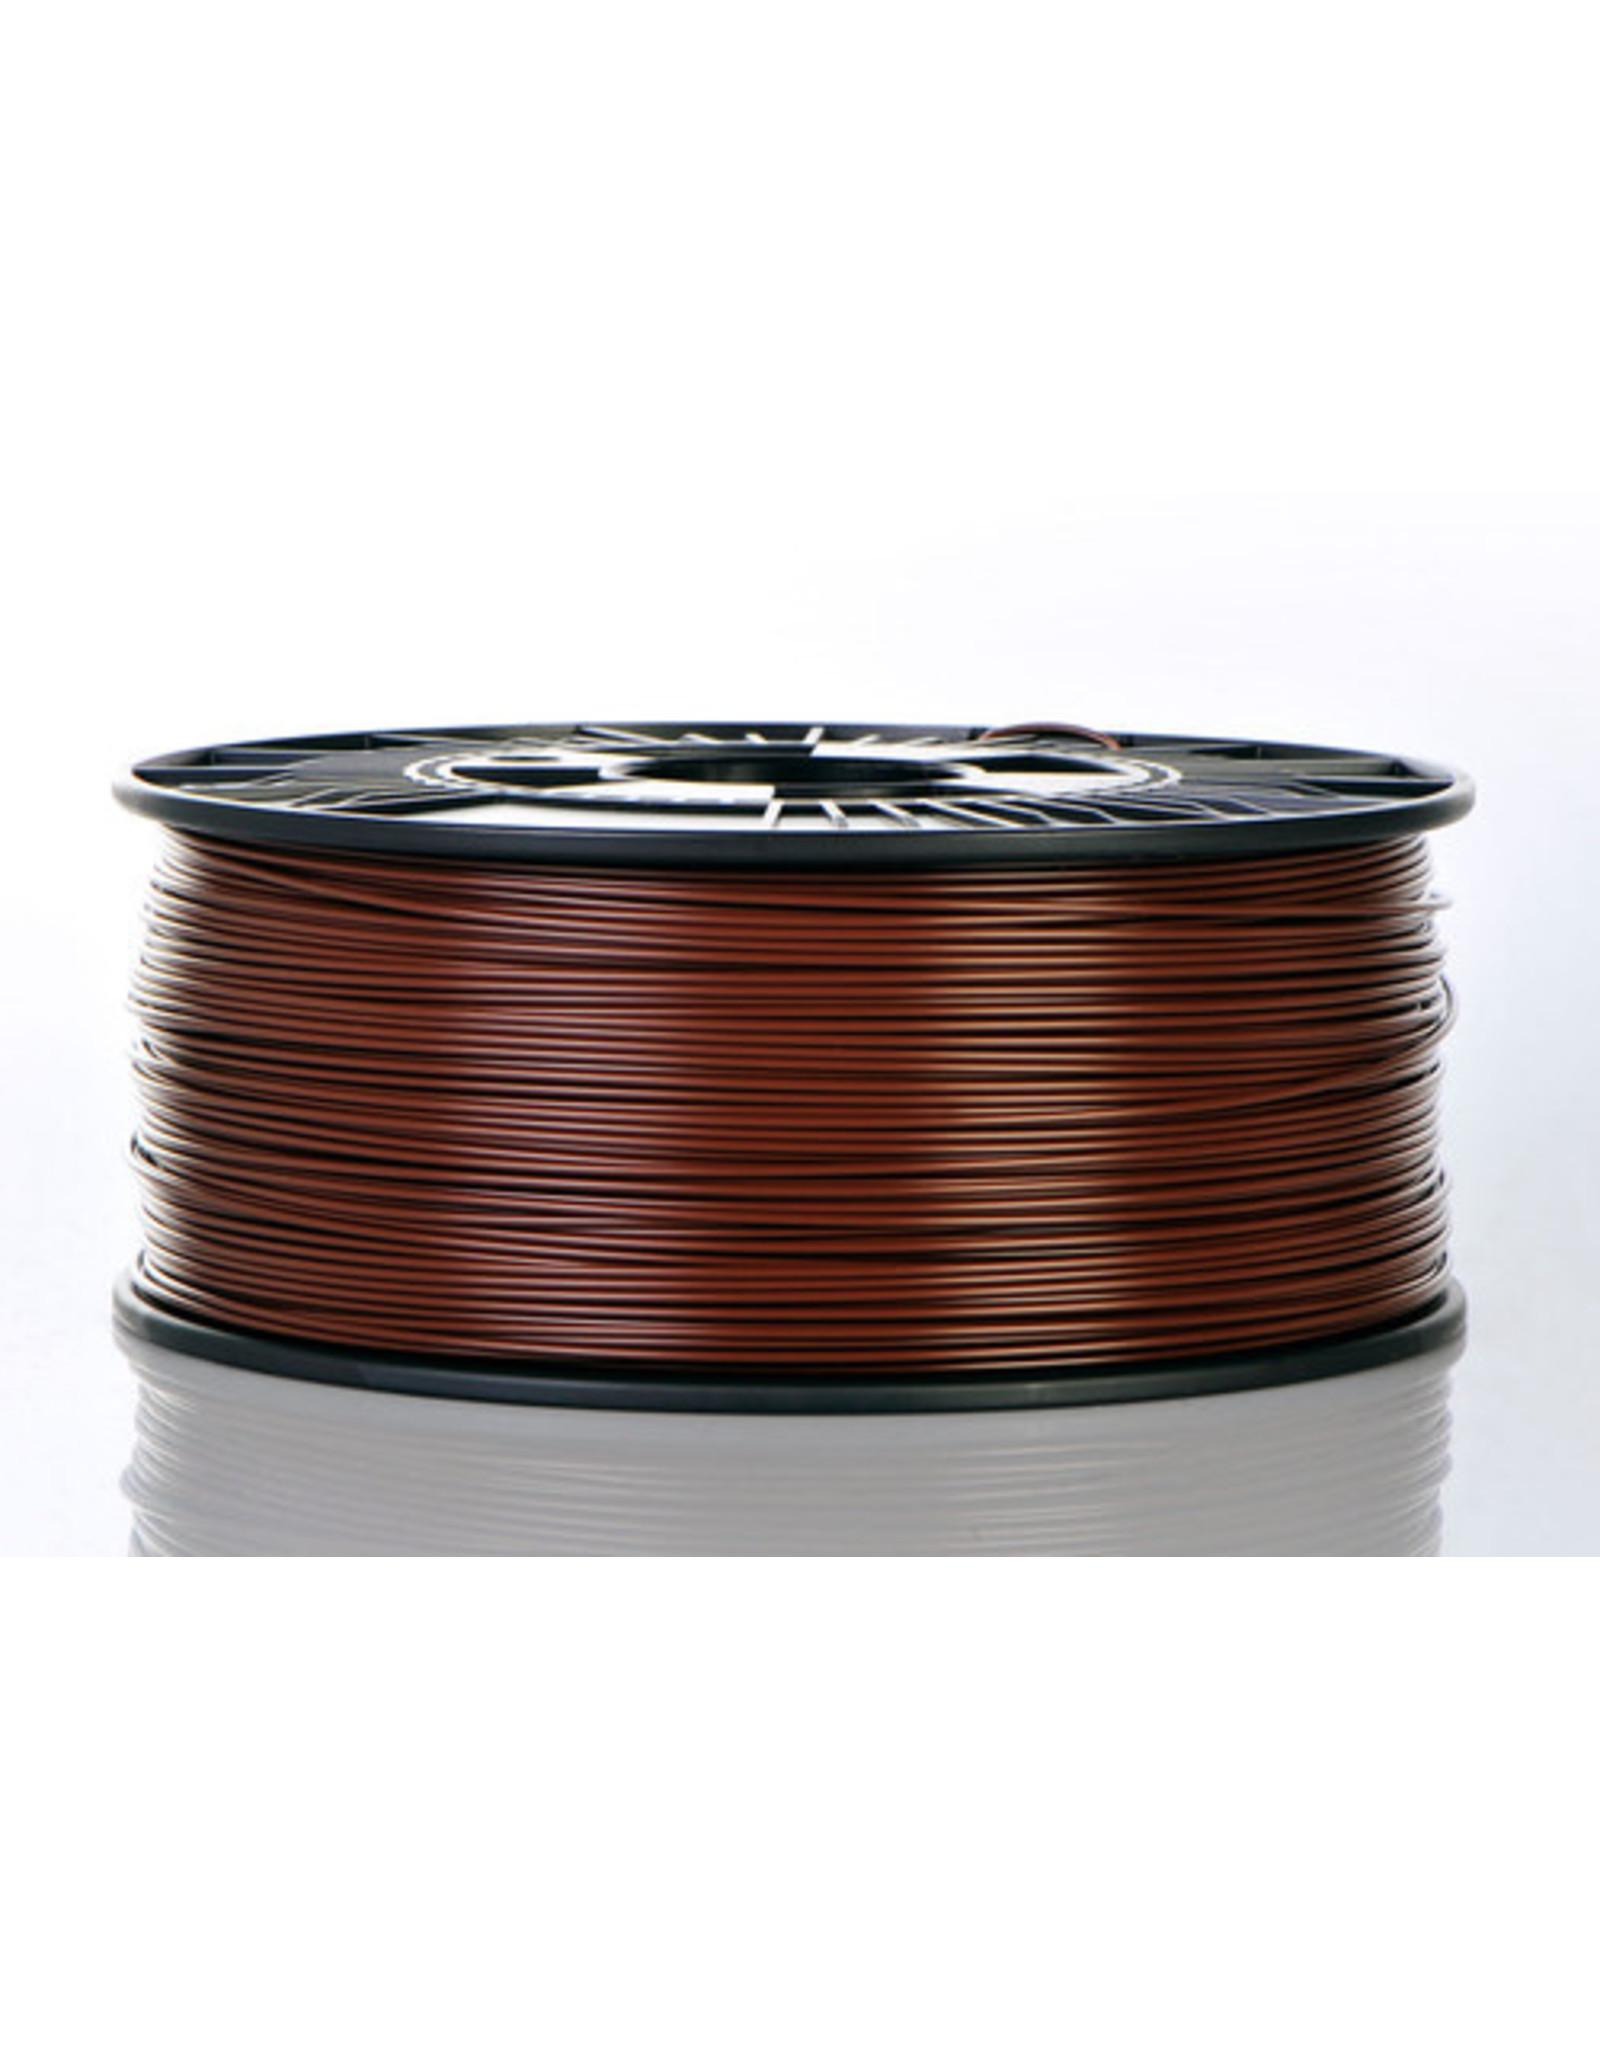 Material4Print ABS Choco bruin 1.75mm 1kg